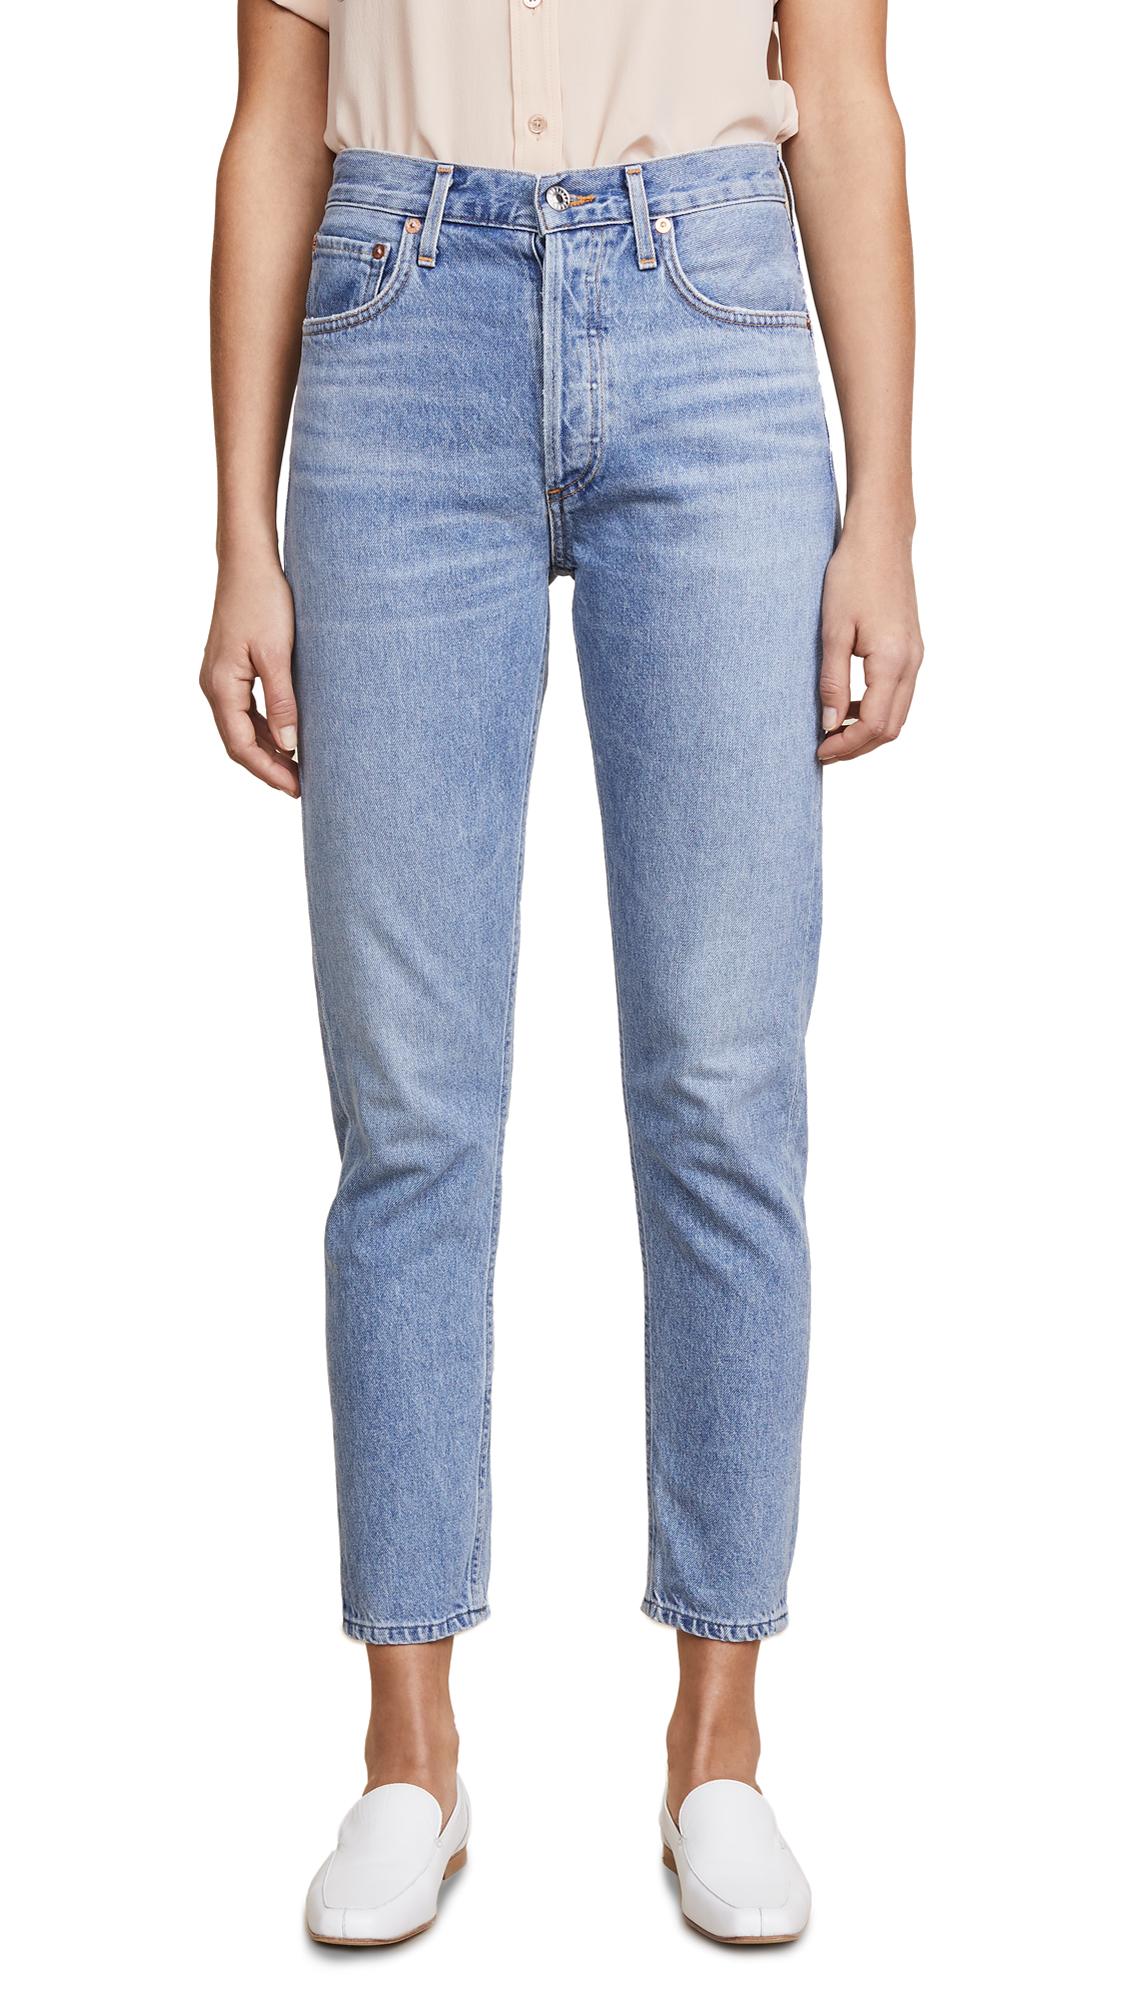 AGOLDE Jamie High Rise Classic Jeans In Brooklyn